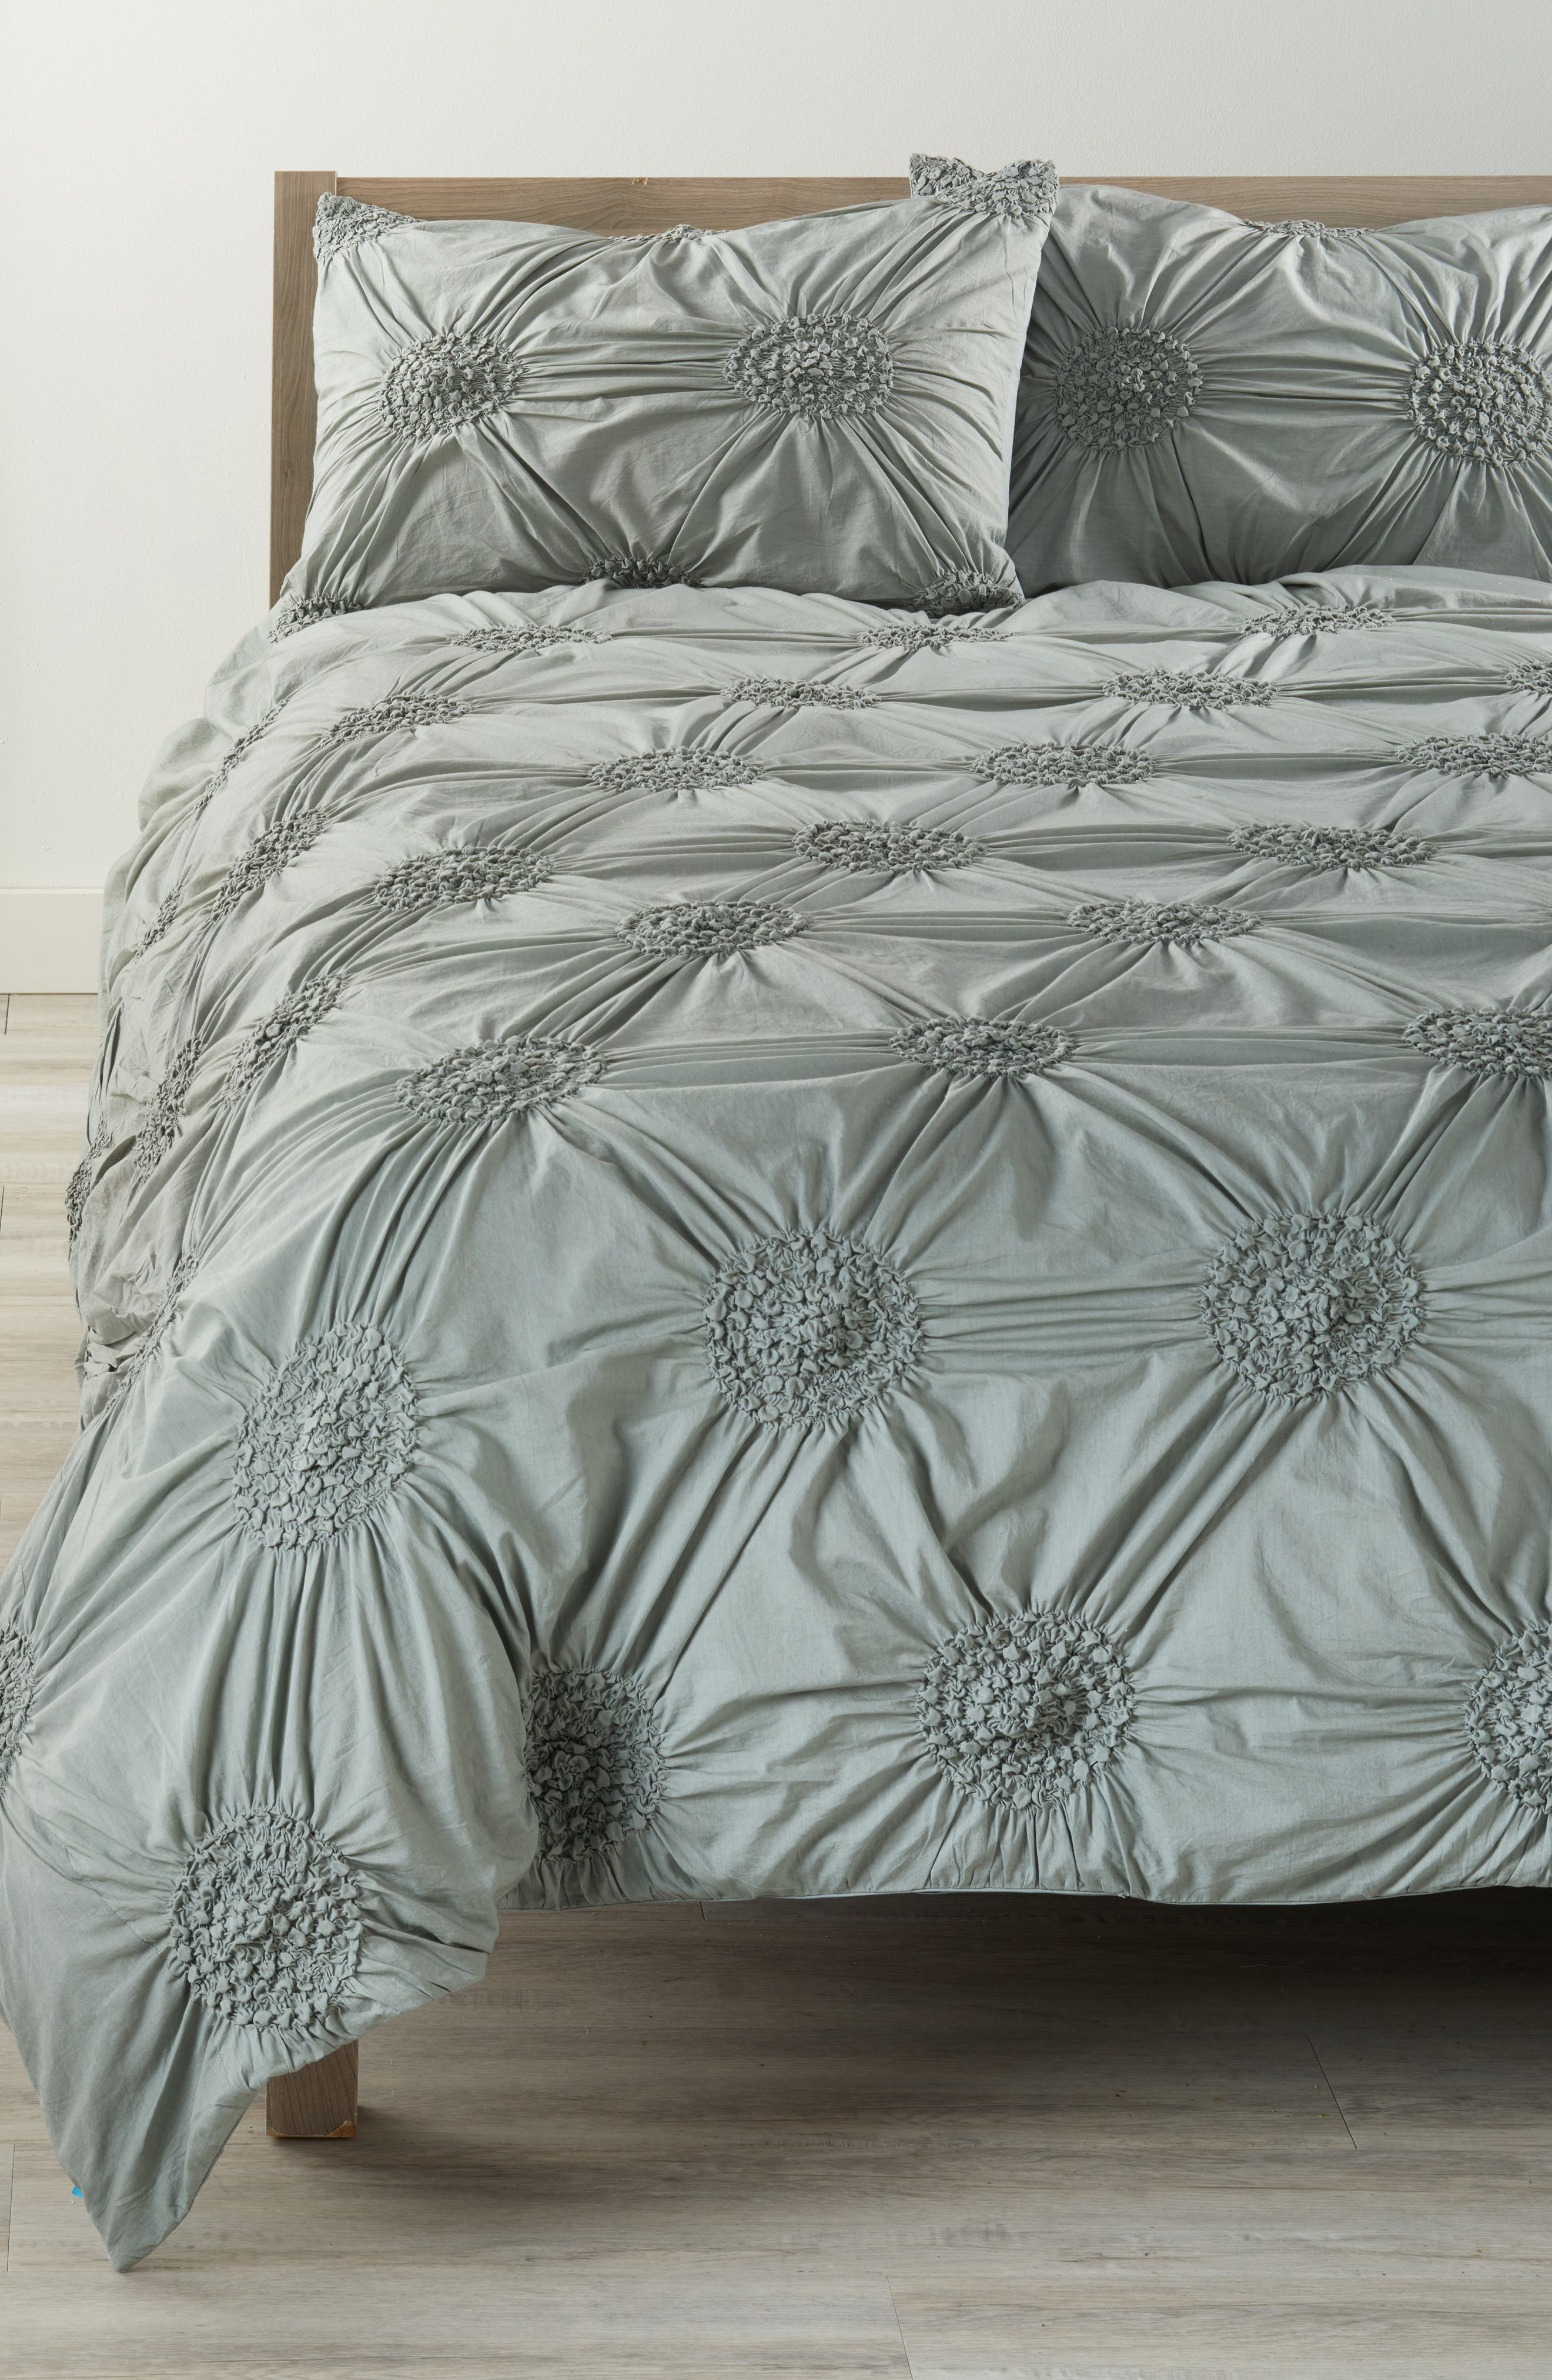 linen discount department studio a sets tahari max goods of quilt bag queen bed stores full marshalls size home set bedding store bathroom sheets in comforter